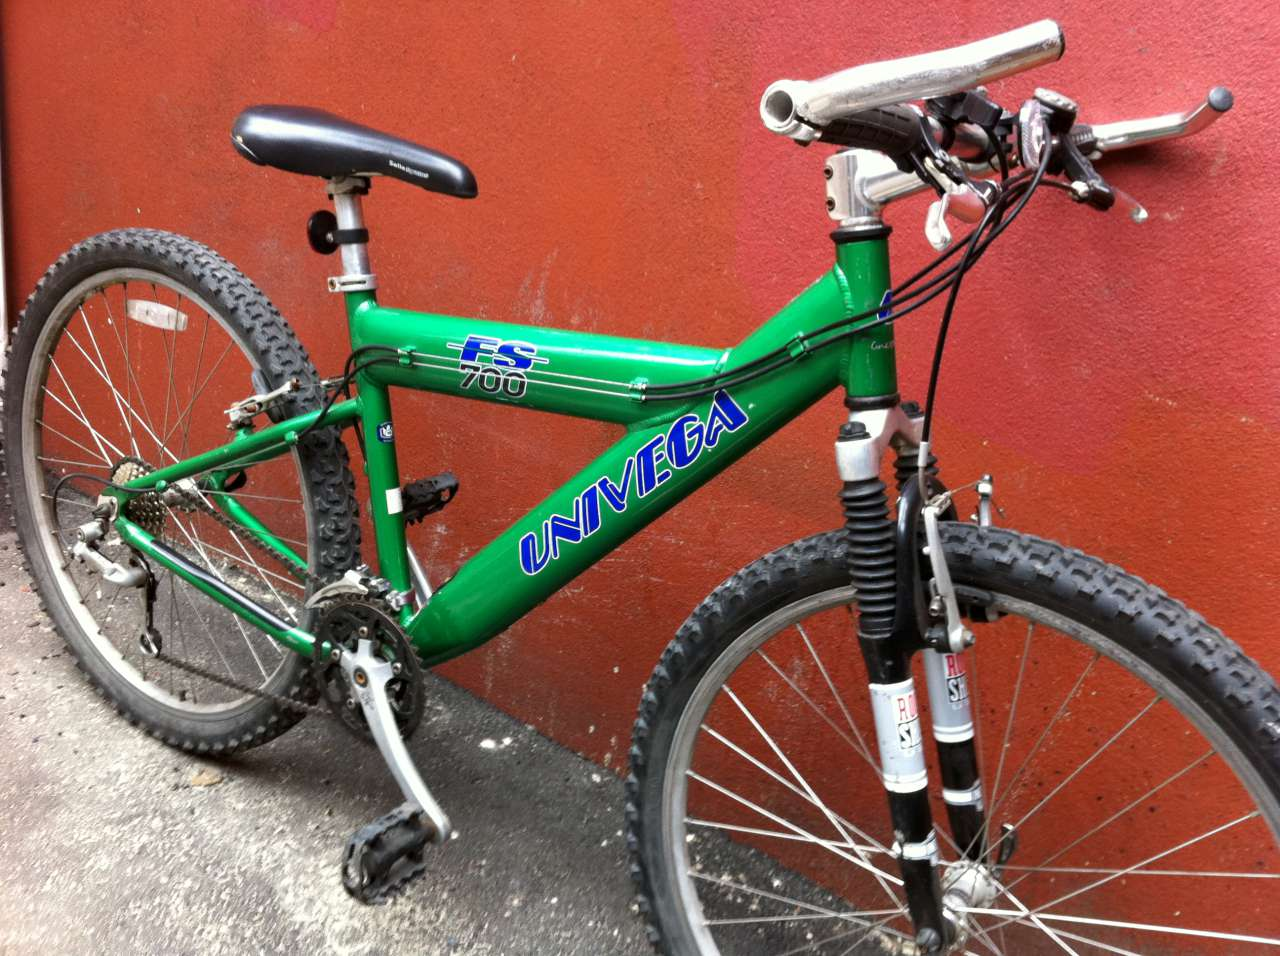 Bike Boom Refurbished Bikes 1998 Univega Fs700 Mountain Bike